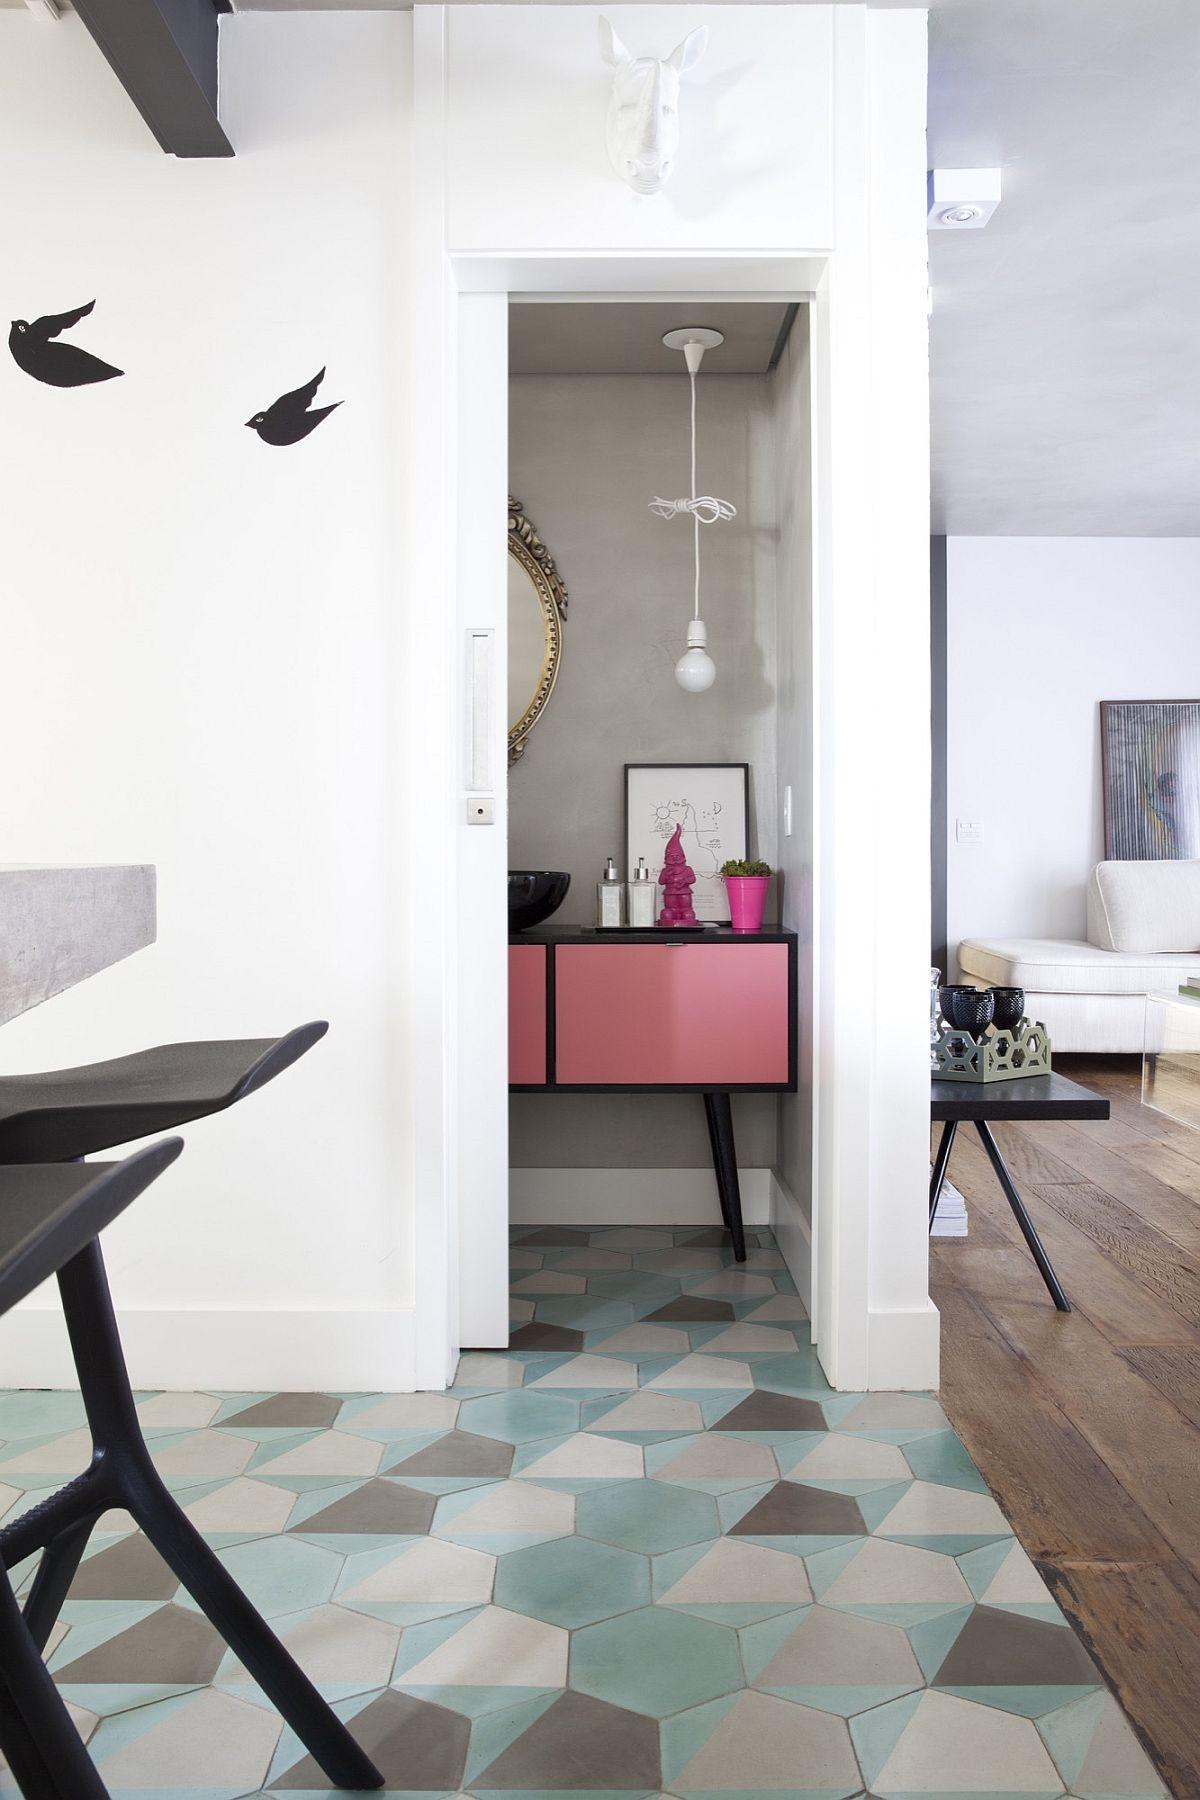 Hexagonal-floor-tiles-delineate-the-kitchen-space-in-style